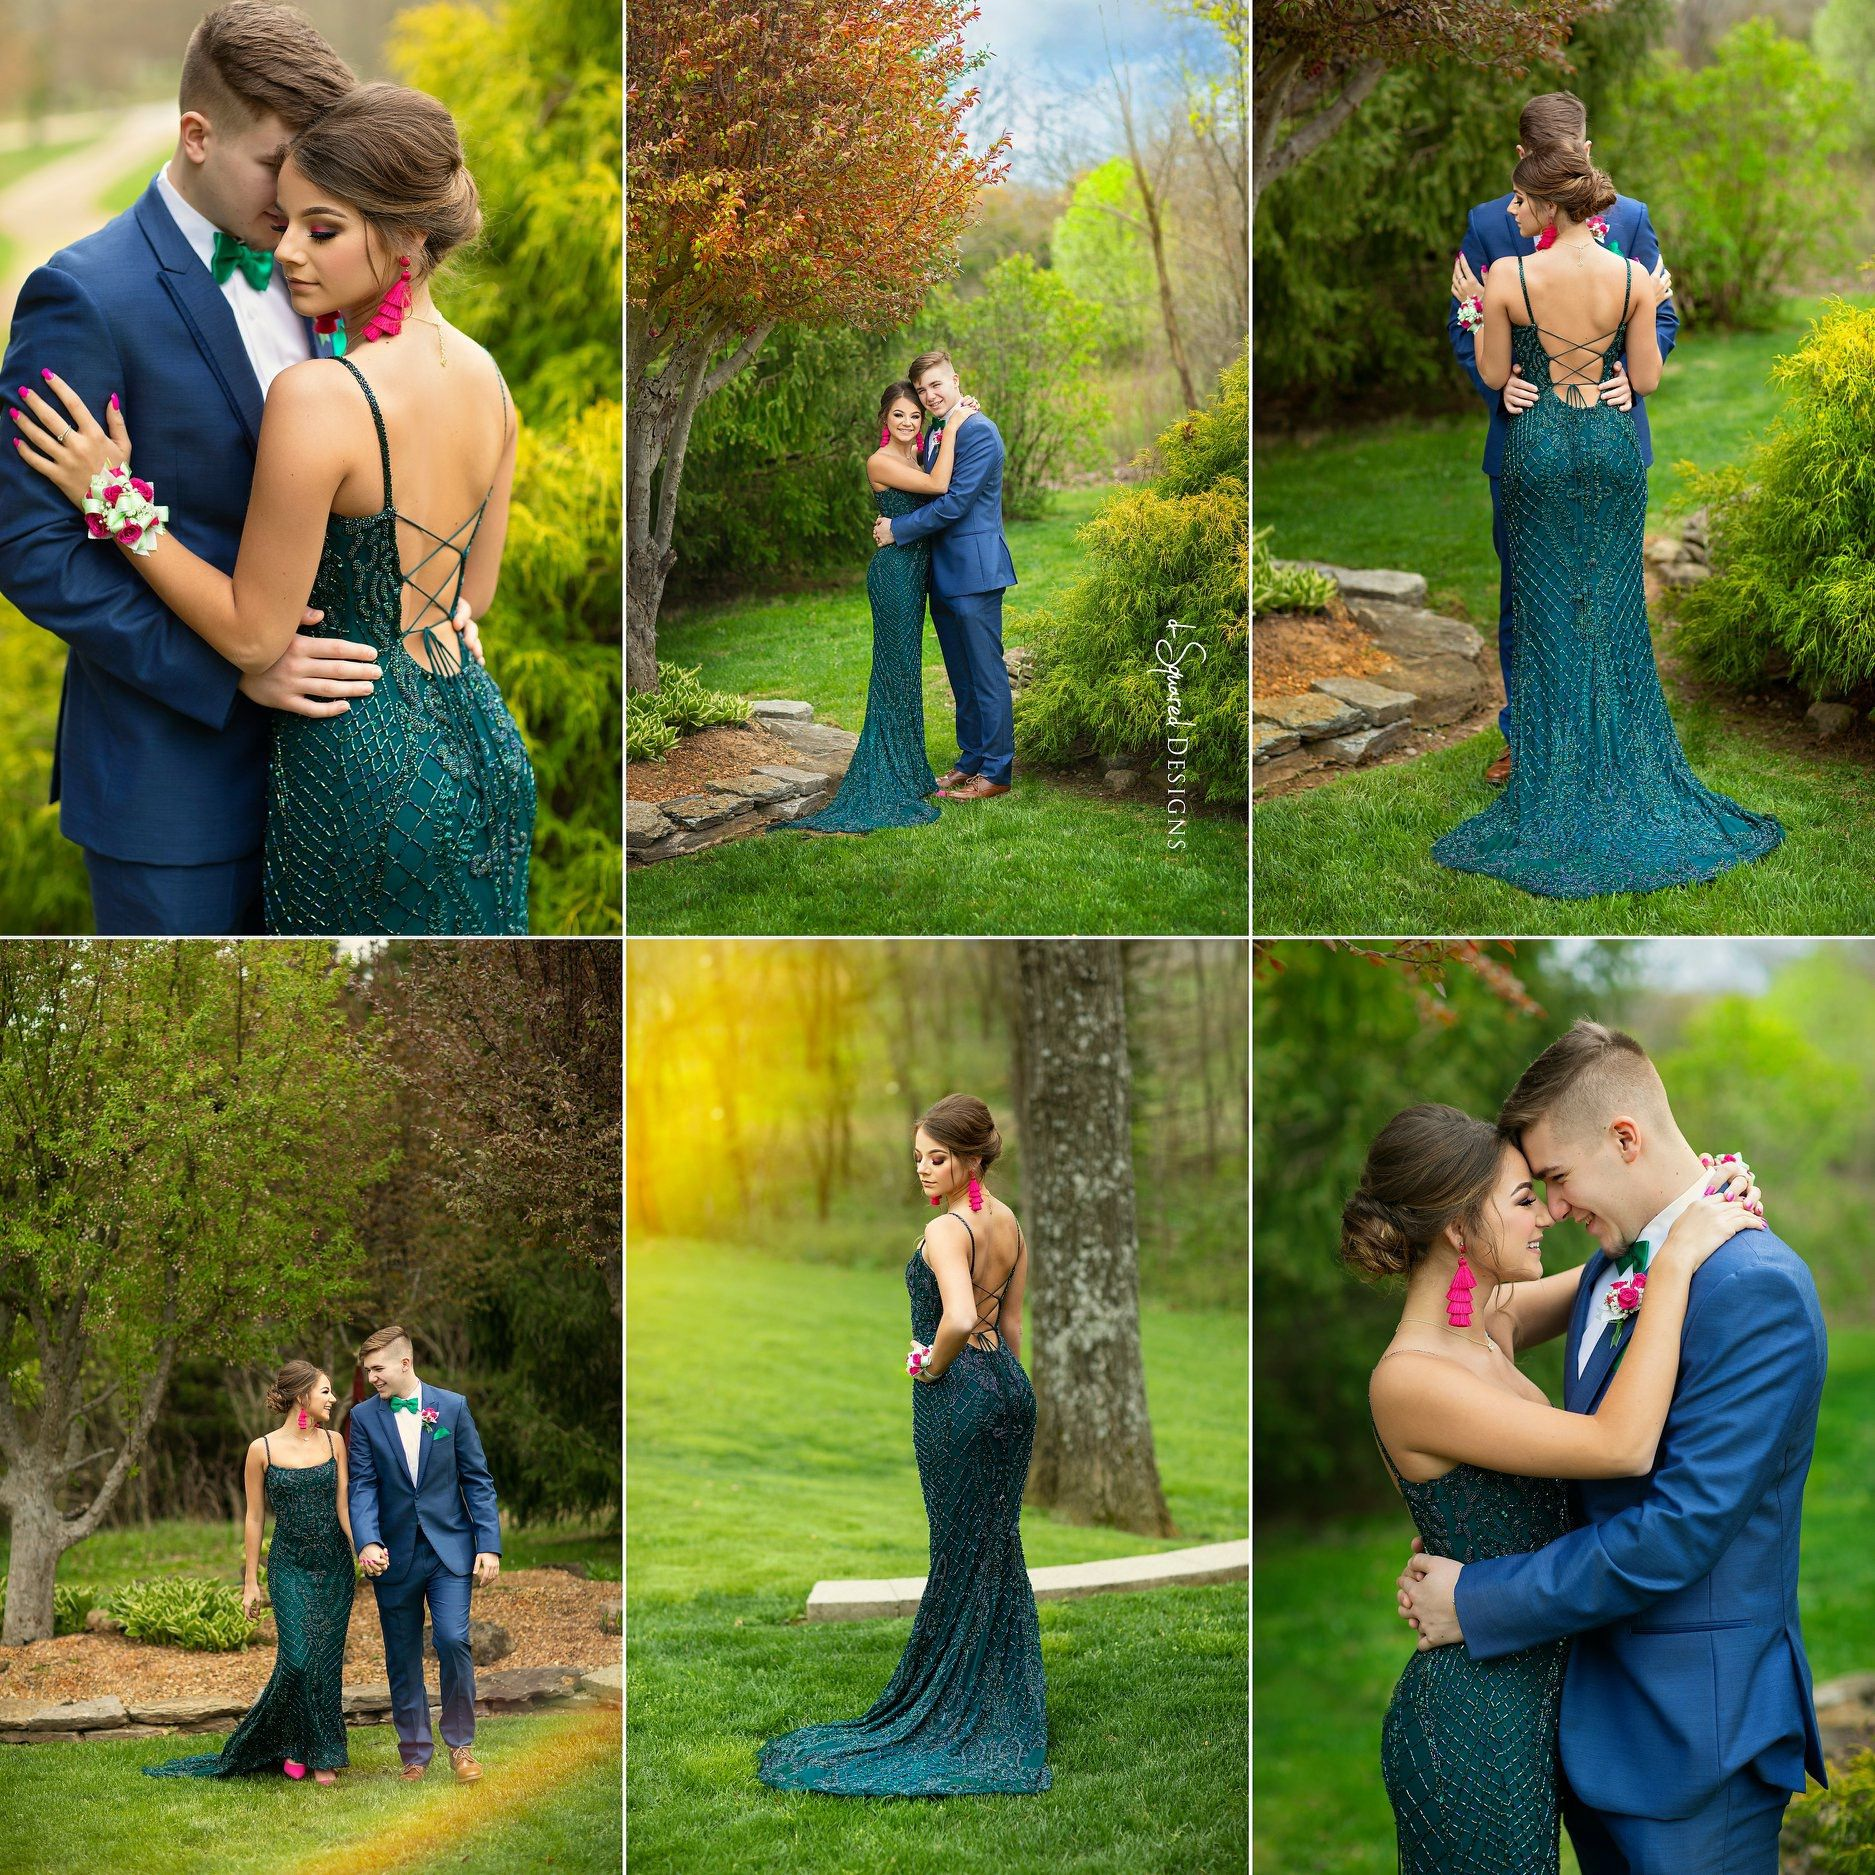 Prom photography inspiration